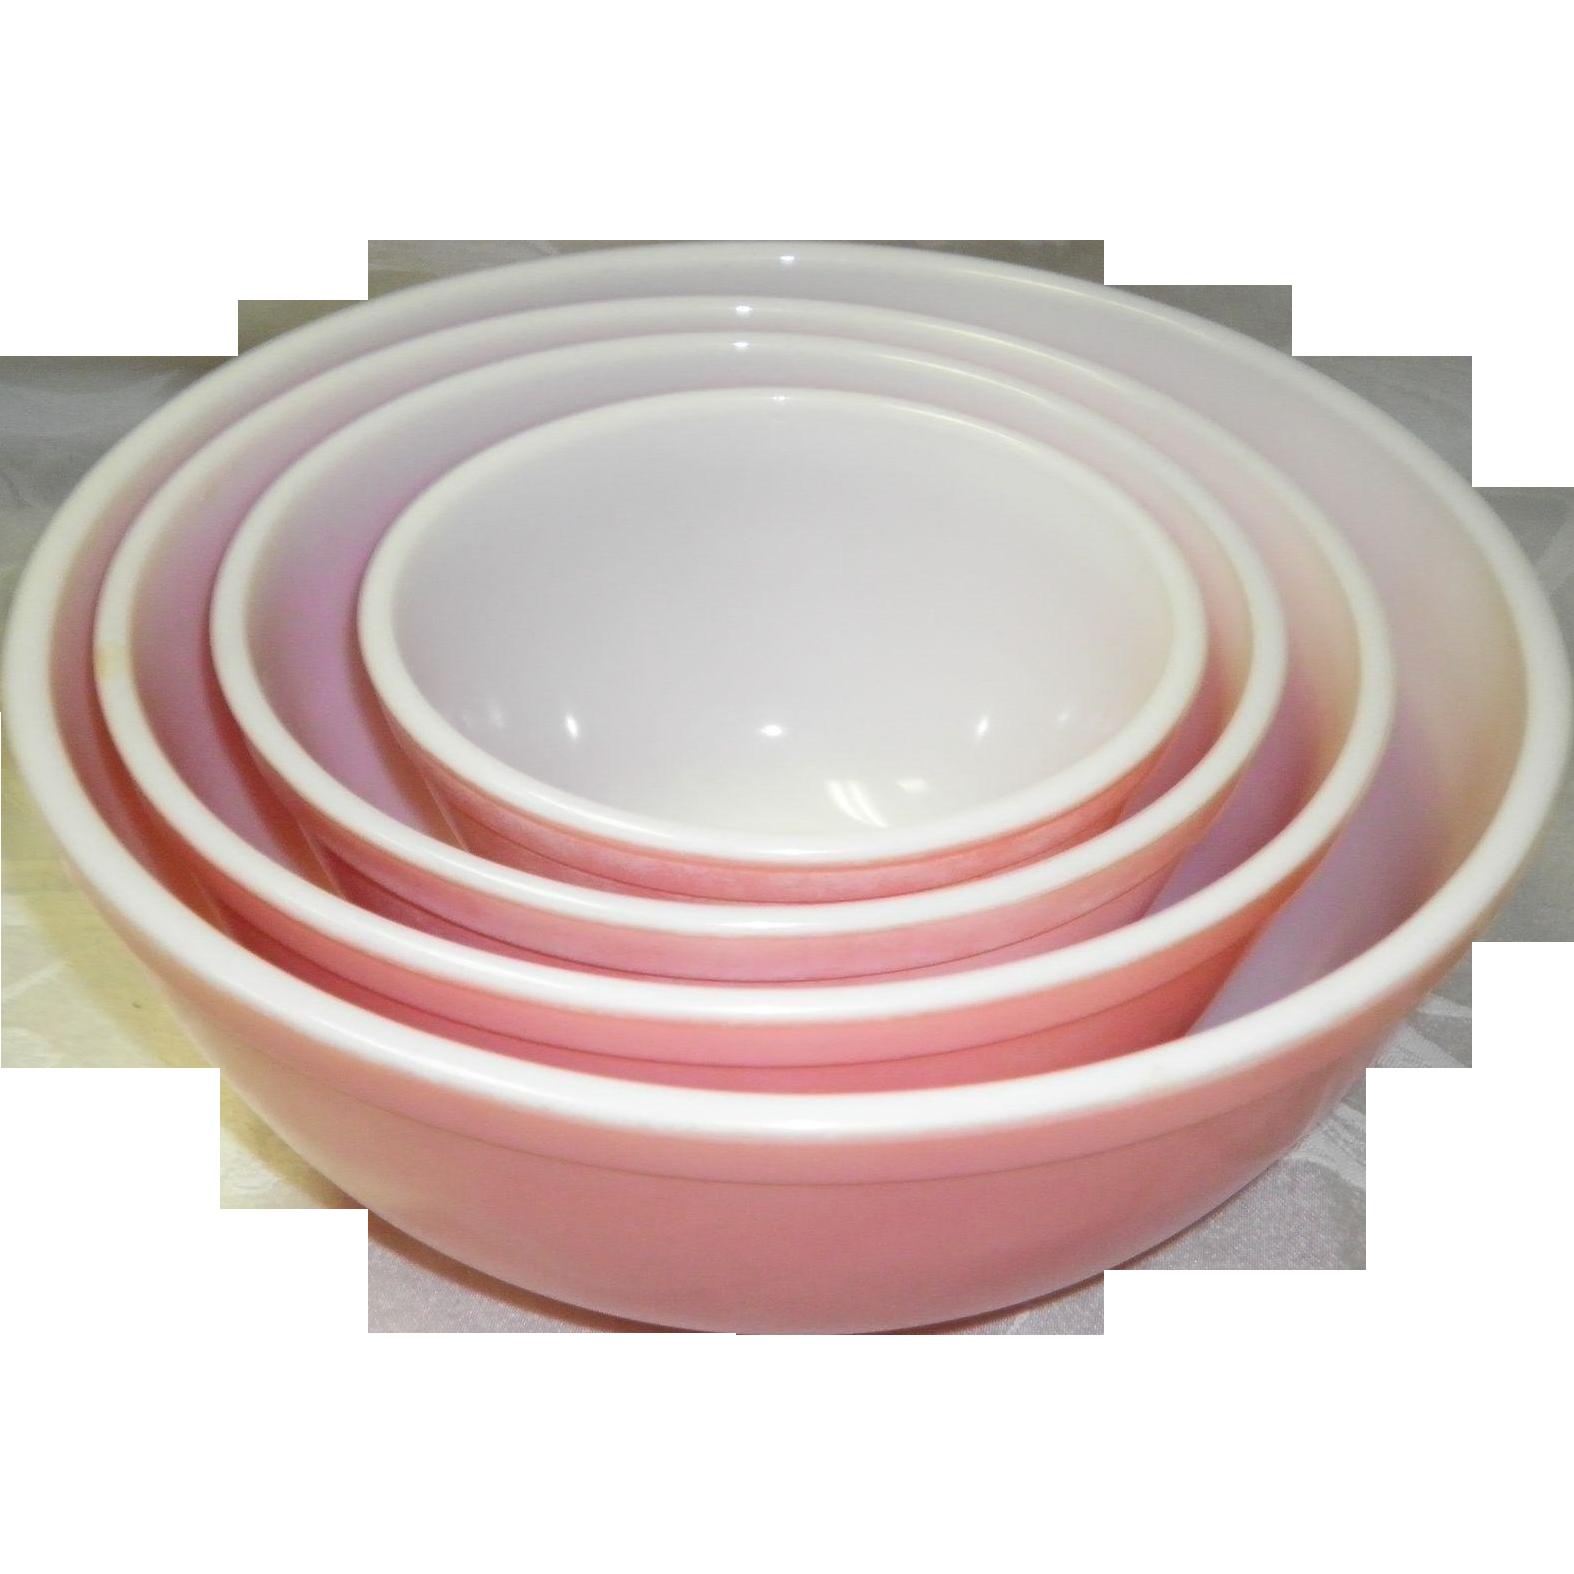 Vintage Pyrex 4 Pink Nesting Bowls 401- 402 - 403 - 404